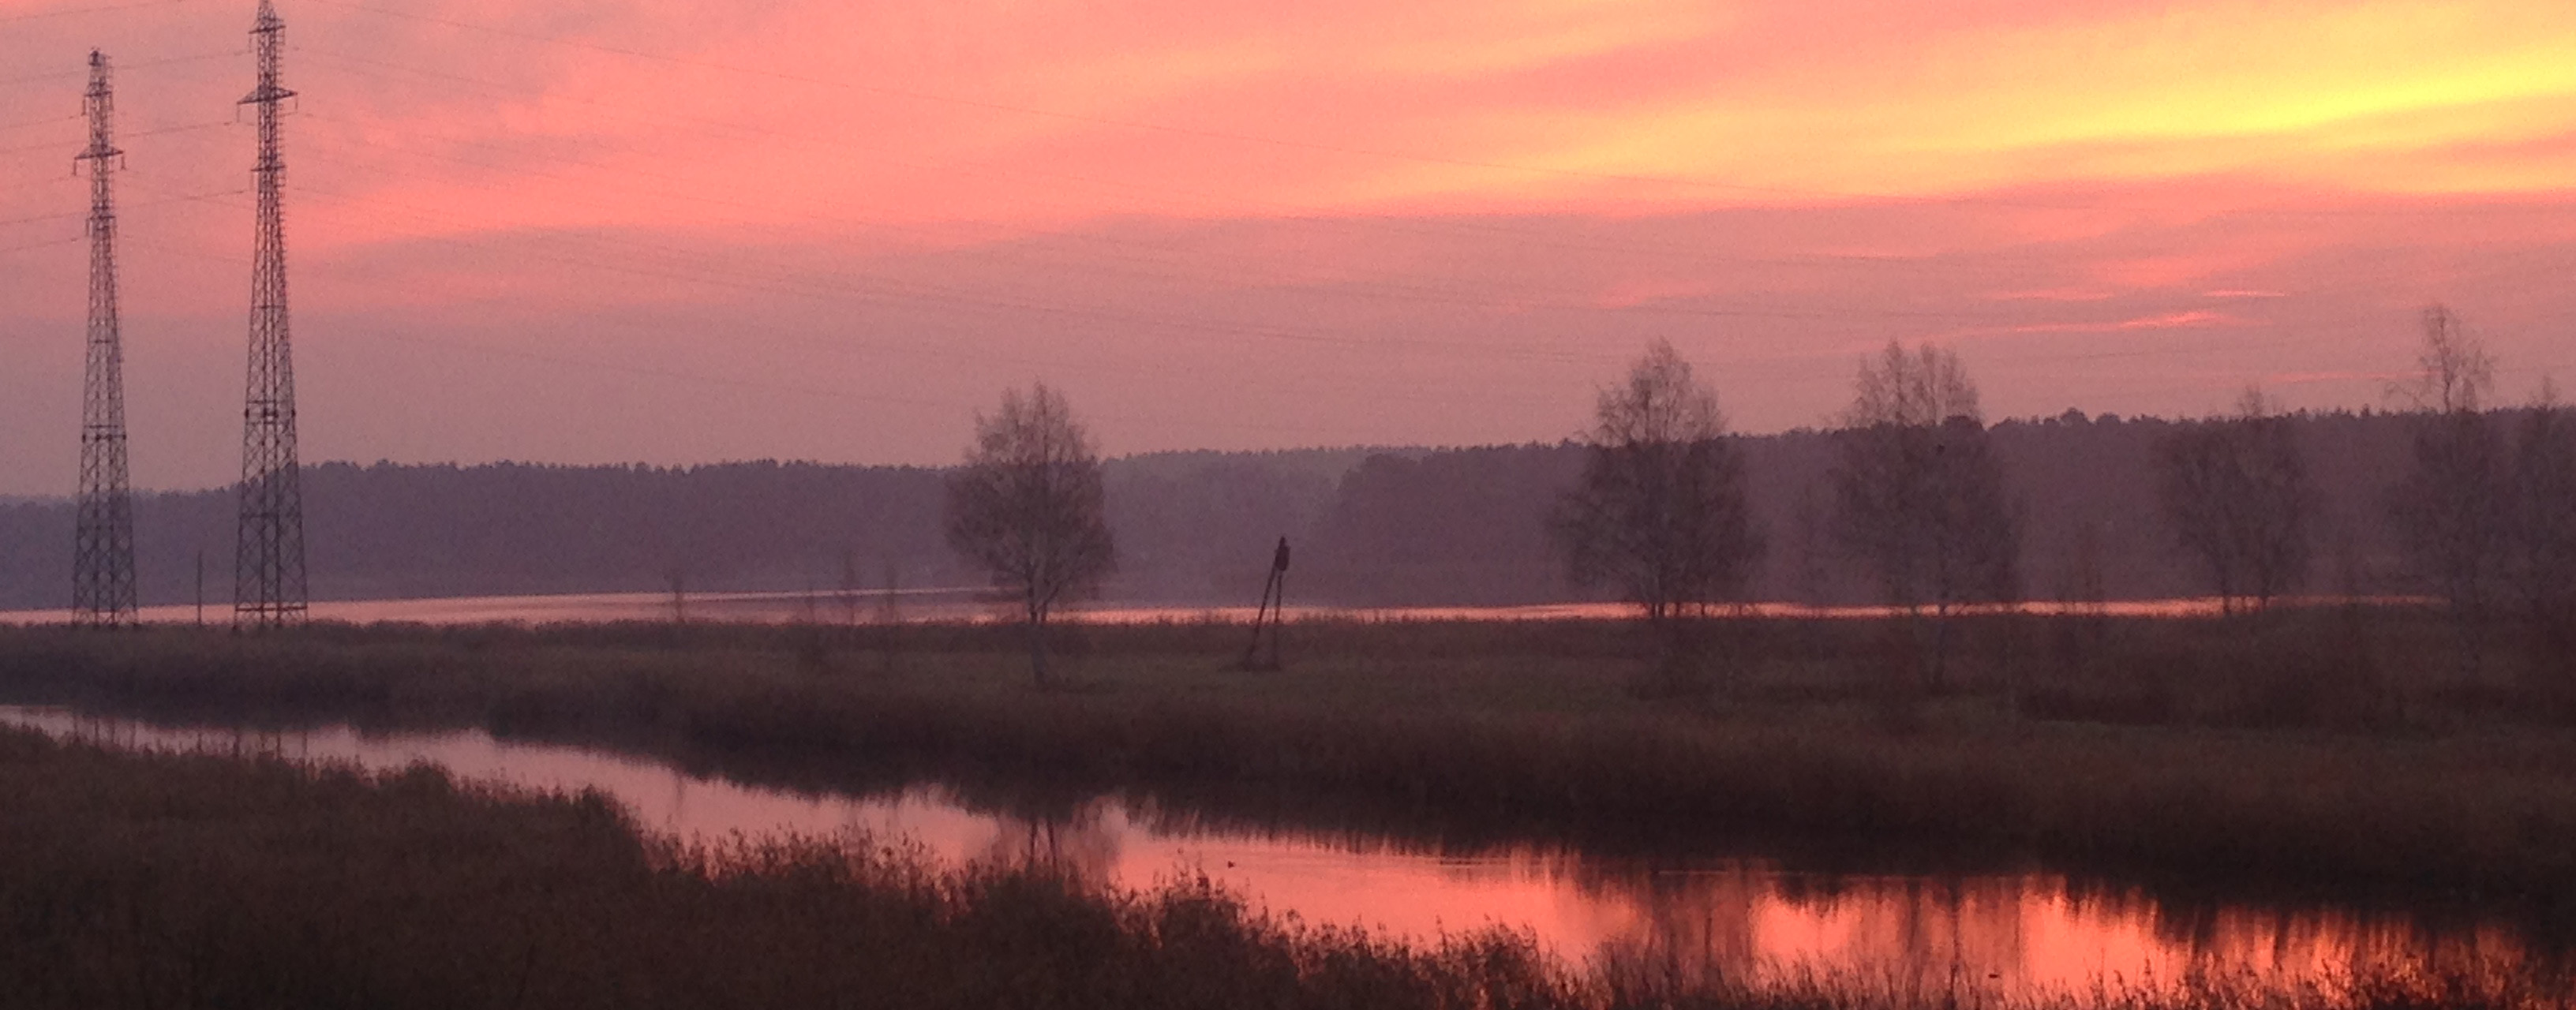 Закат на реке Лиелупе Прибалтика Альберт Сафиуллин